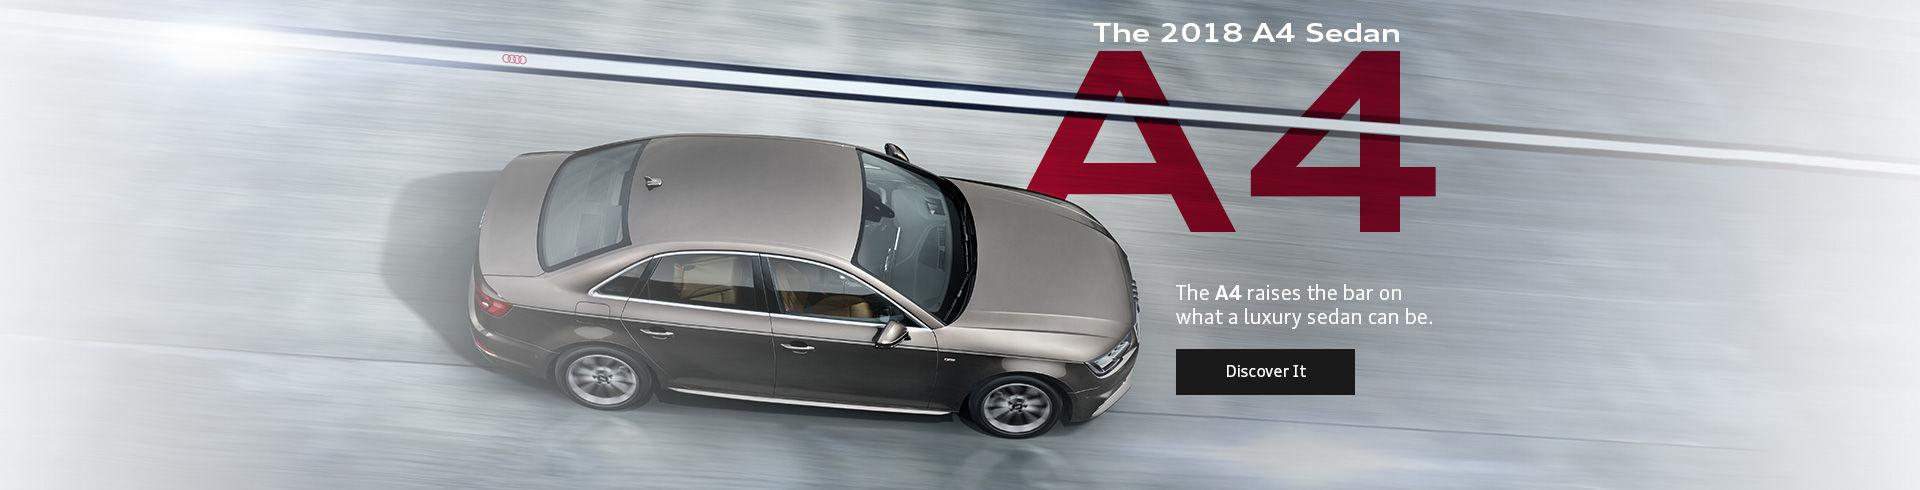 Header Home Audi-A4 Sedan 2018